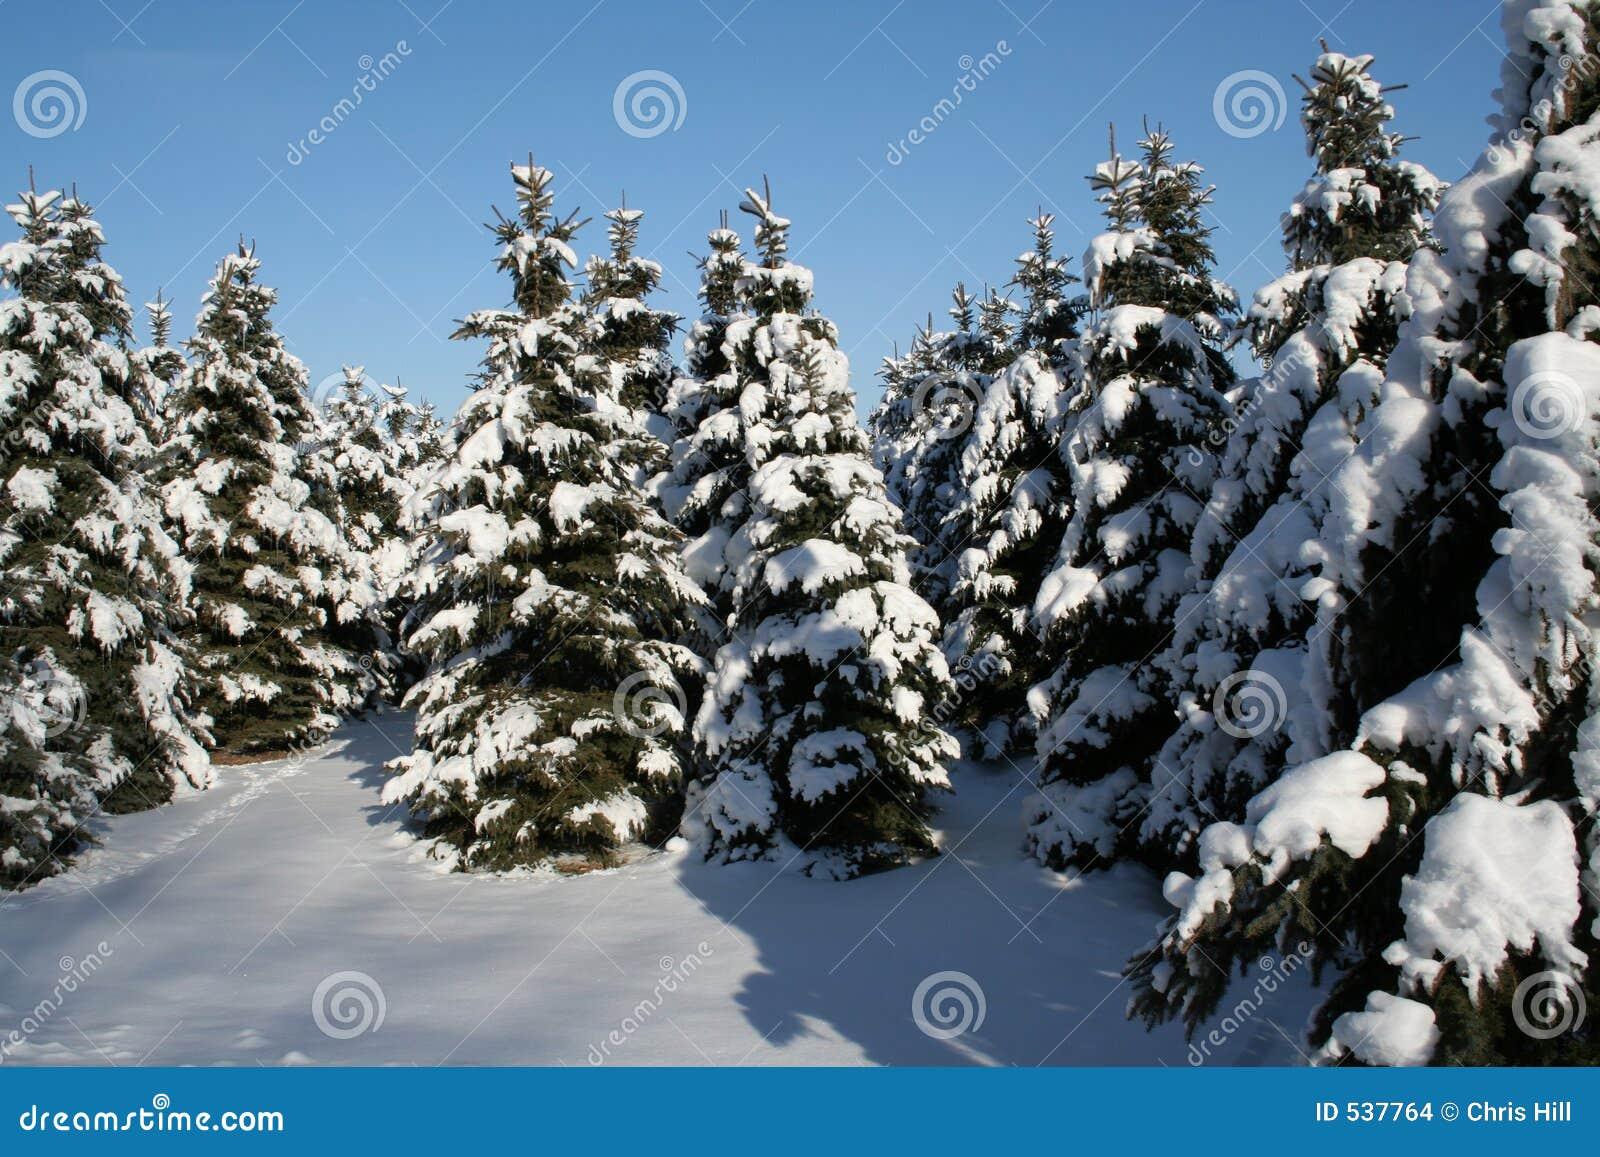 Rboles de hoja perenne nevado foto de archivo imagen de for Arboles para veredas hojas perennes